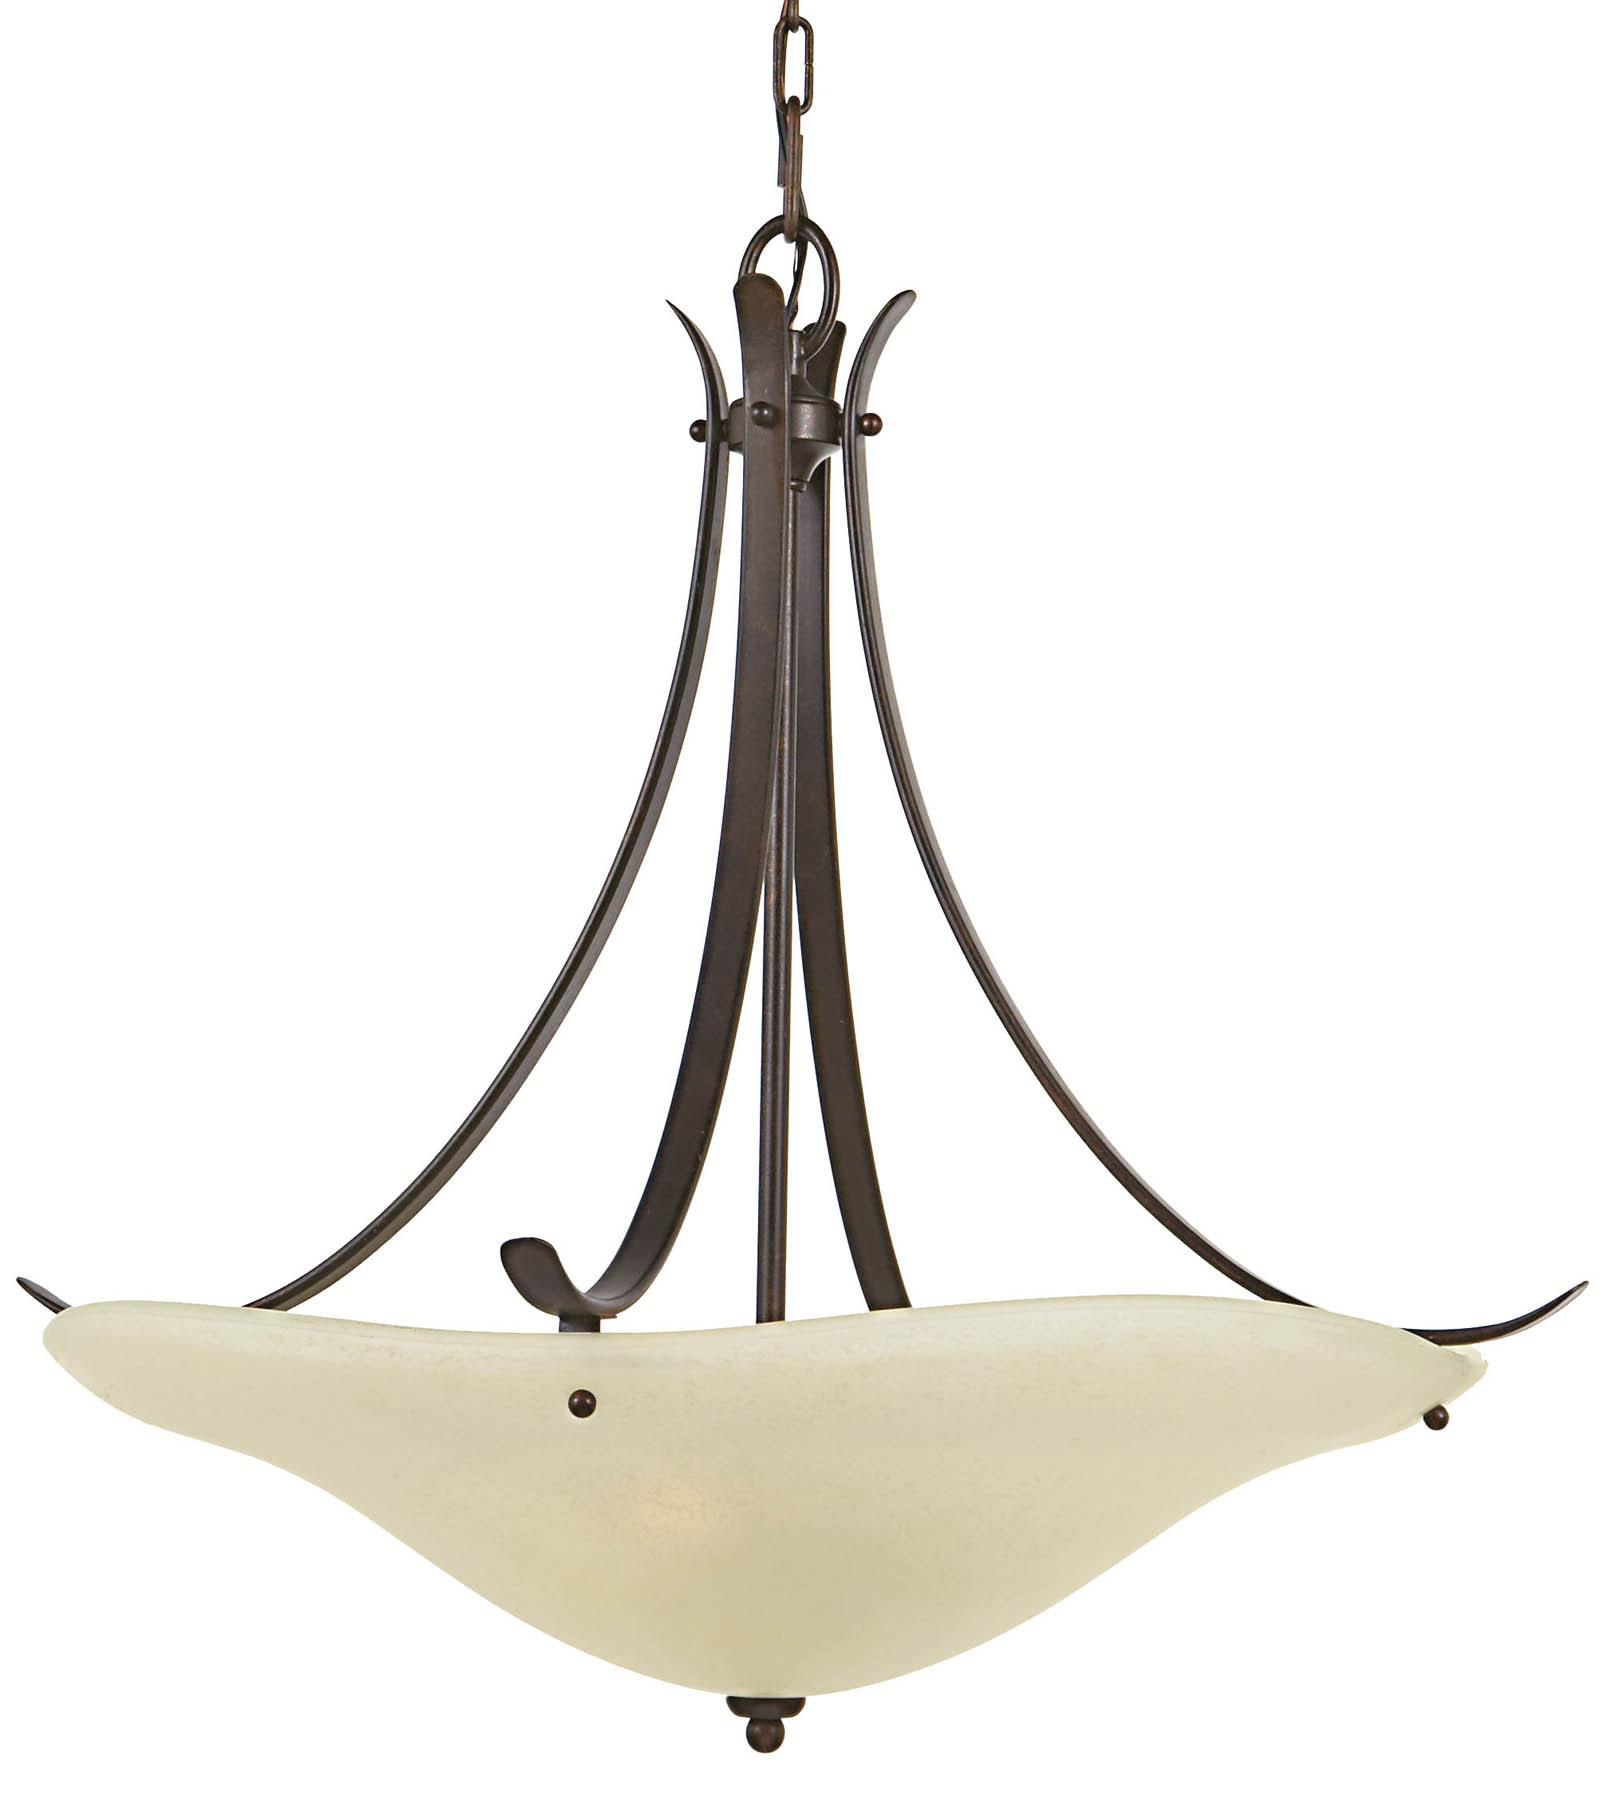 murray feiss fgbz morningside inverted pendant hanging lamp. feiss fgbz morningside inverted pendant hanging lamp